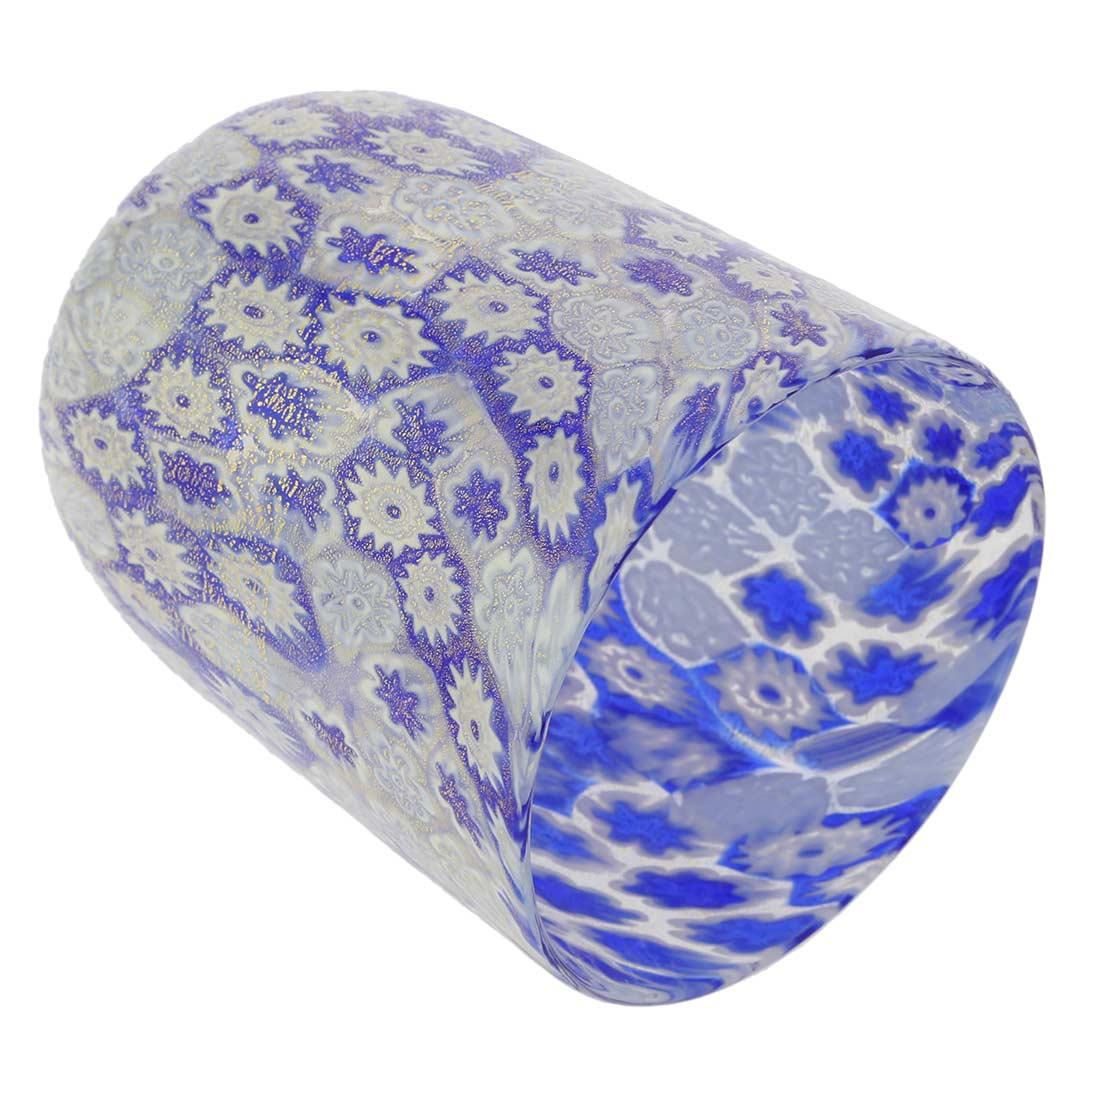 Murano Tumbler - Blue Gold Millefiori